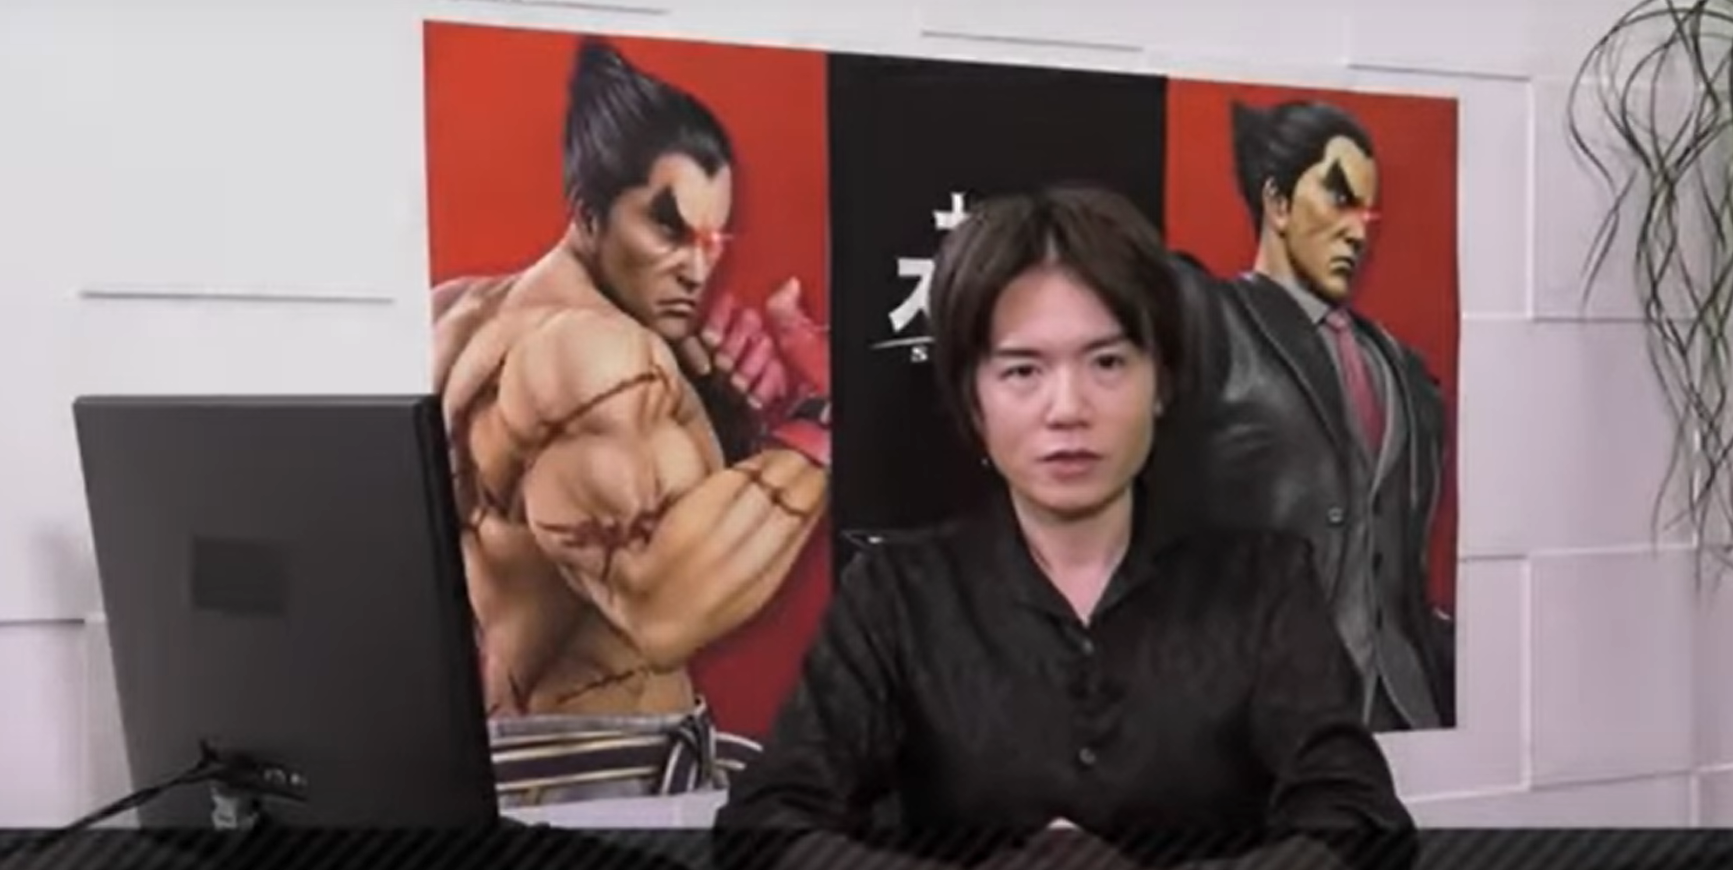 Nintendo Announces Release Date for Tekken DLC Fighter Kazuya Screenshot via Nintendo YouTube